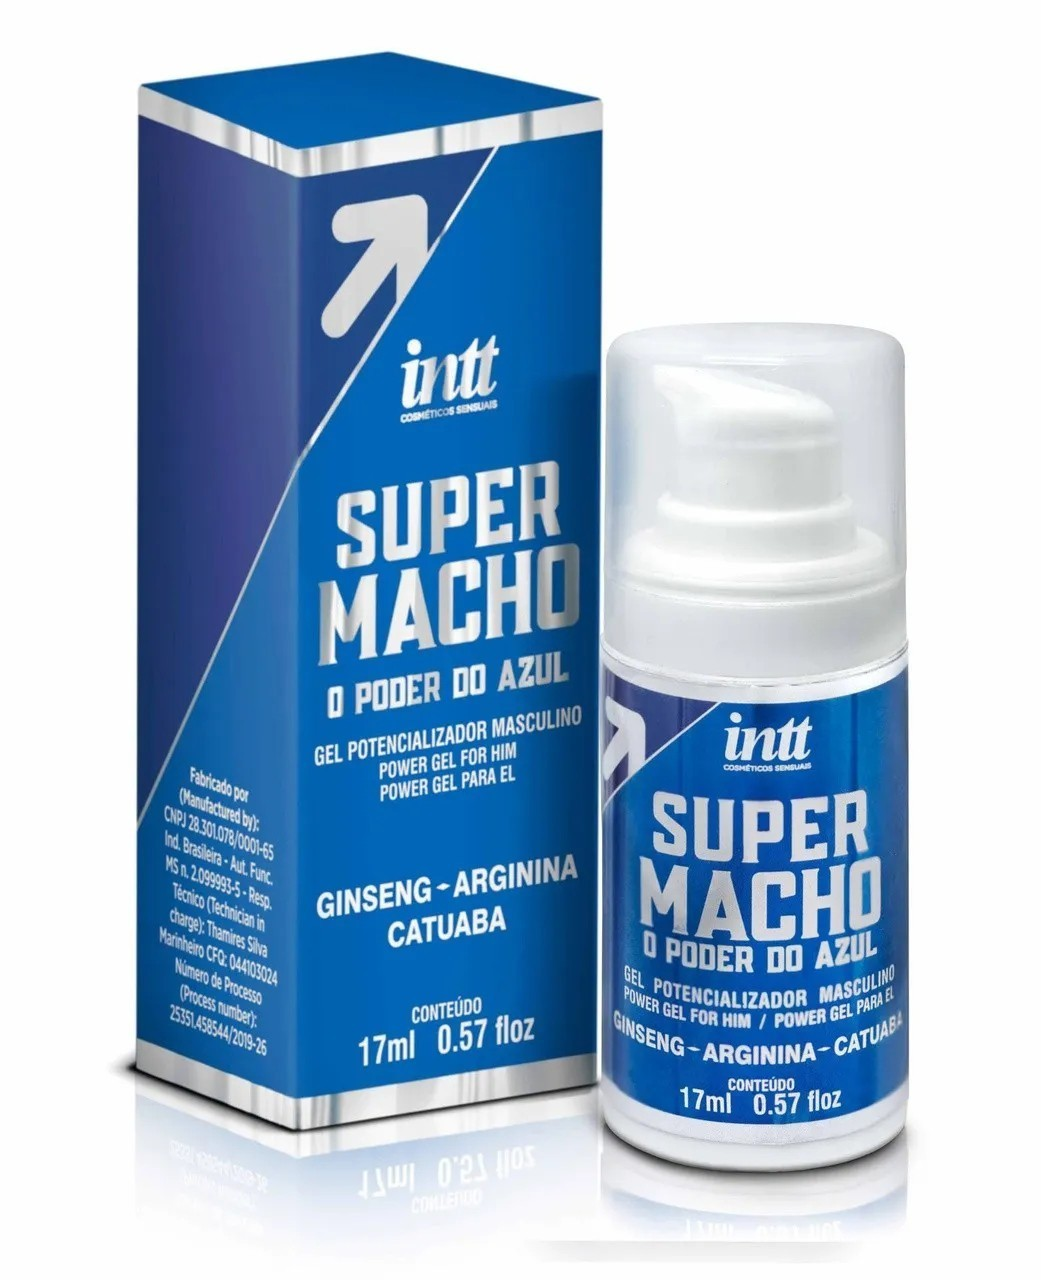 Gel Super Macho - O Poder do Azul - Intt